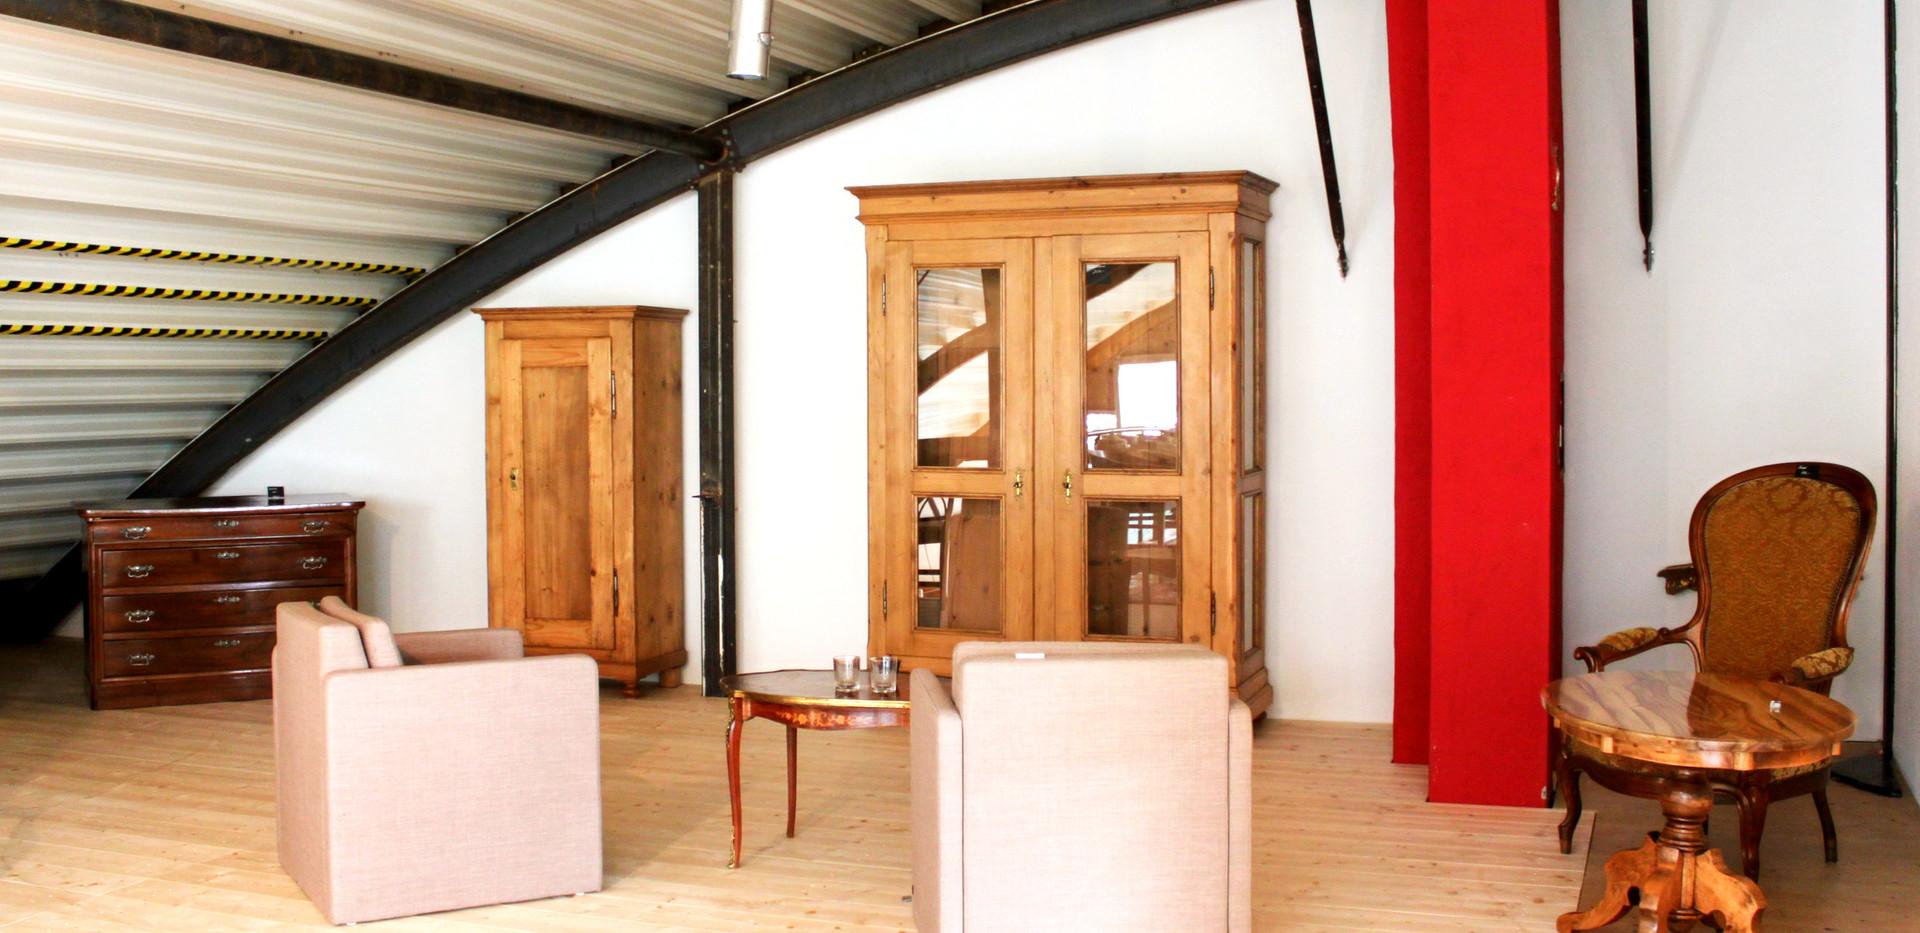 Galerie oben 8.jpg